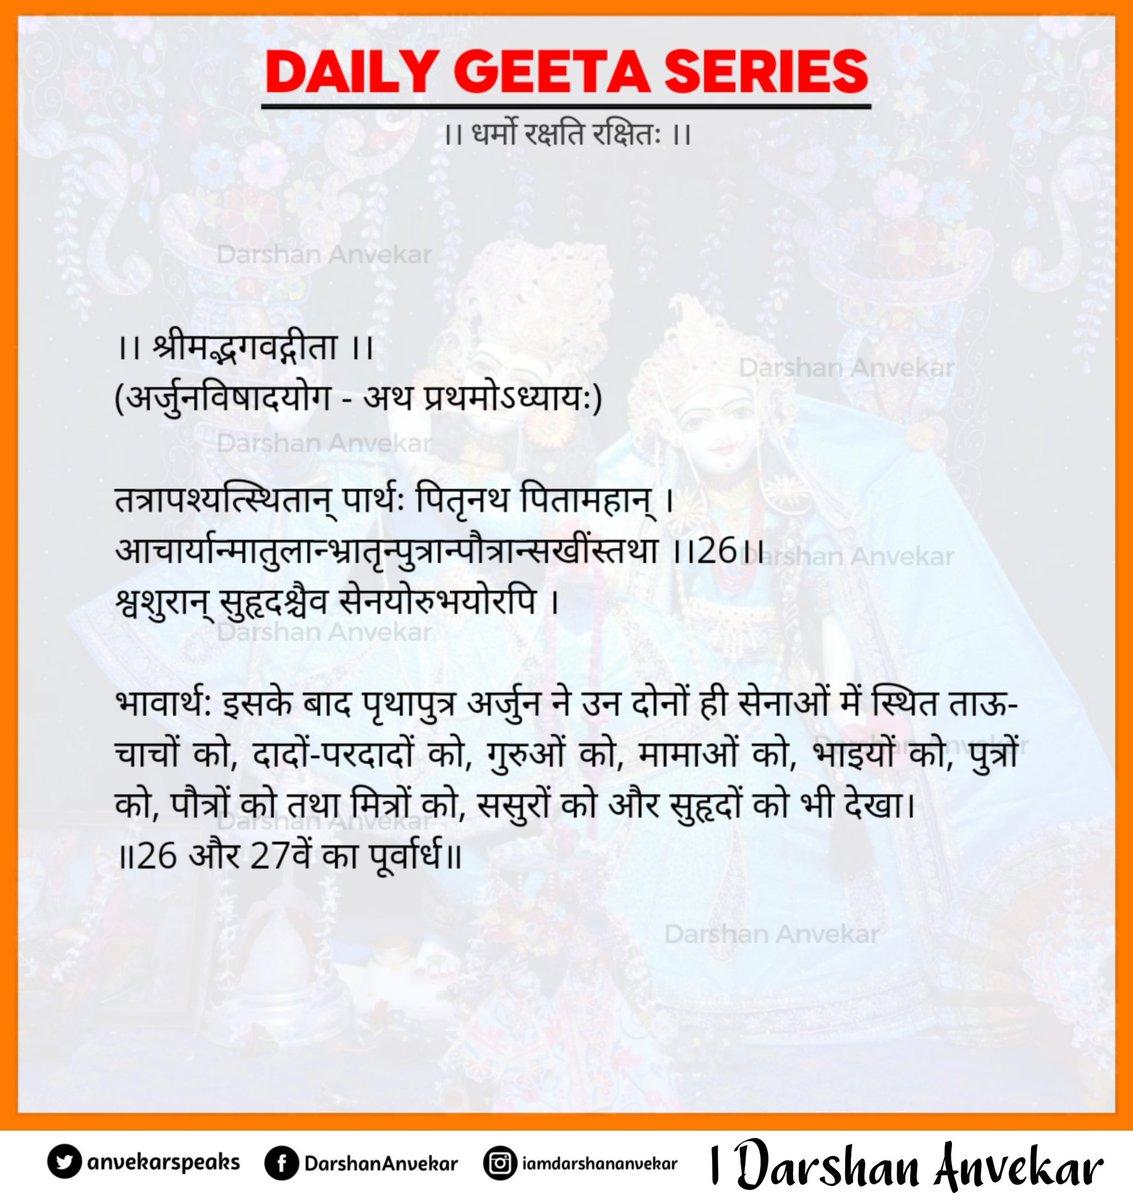 #DailyGeeta #Day23